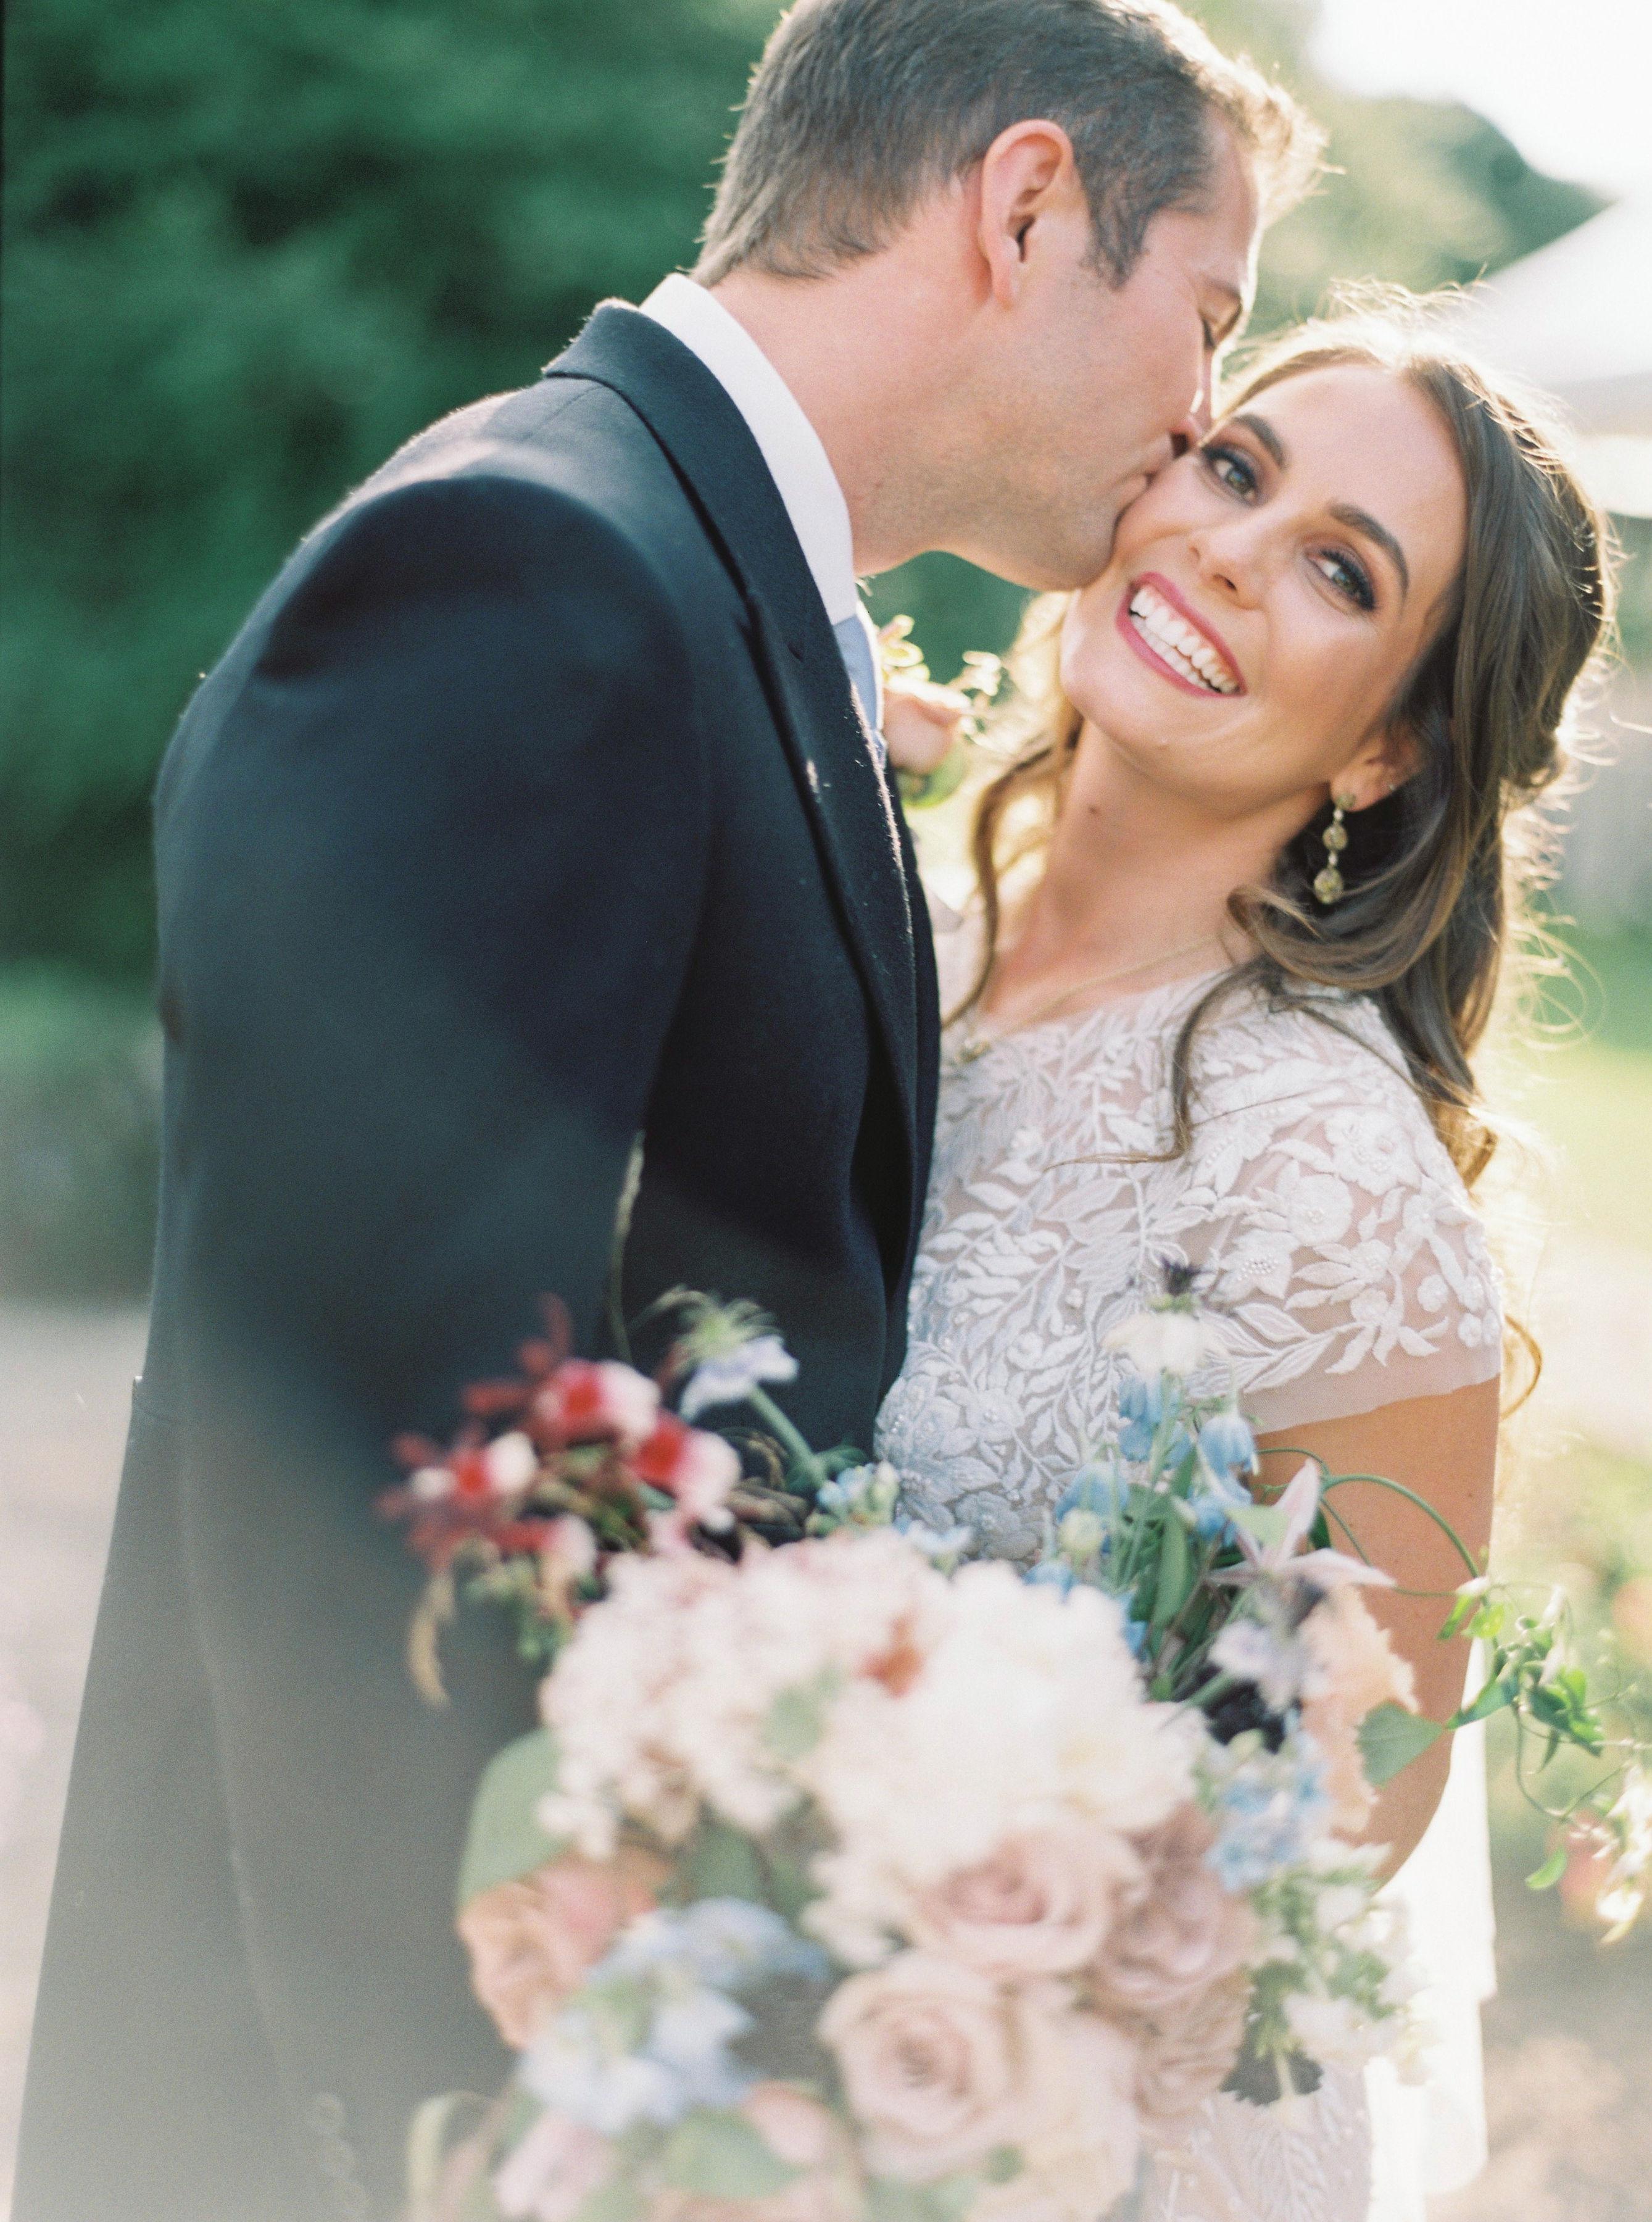 groom kissing bride on cheek outside smiling